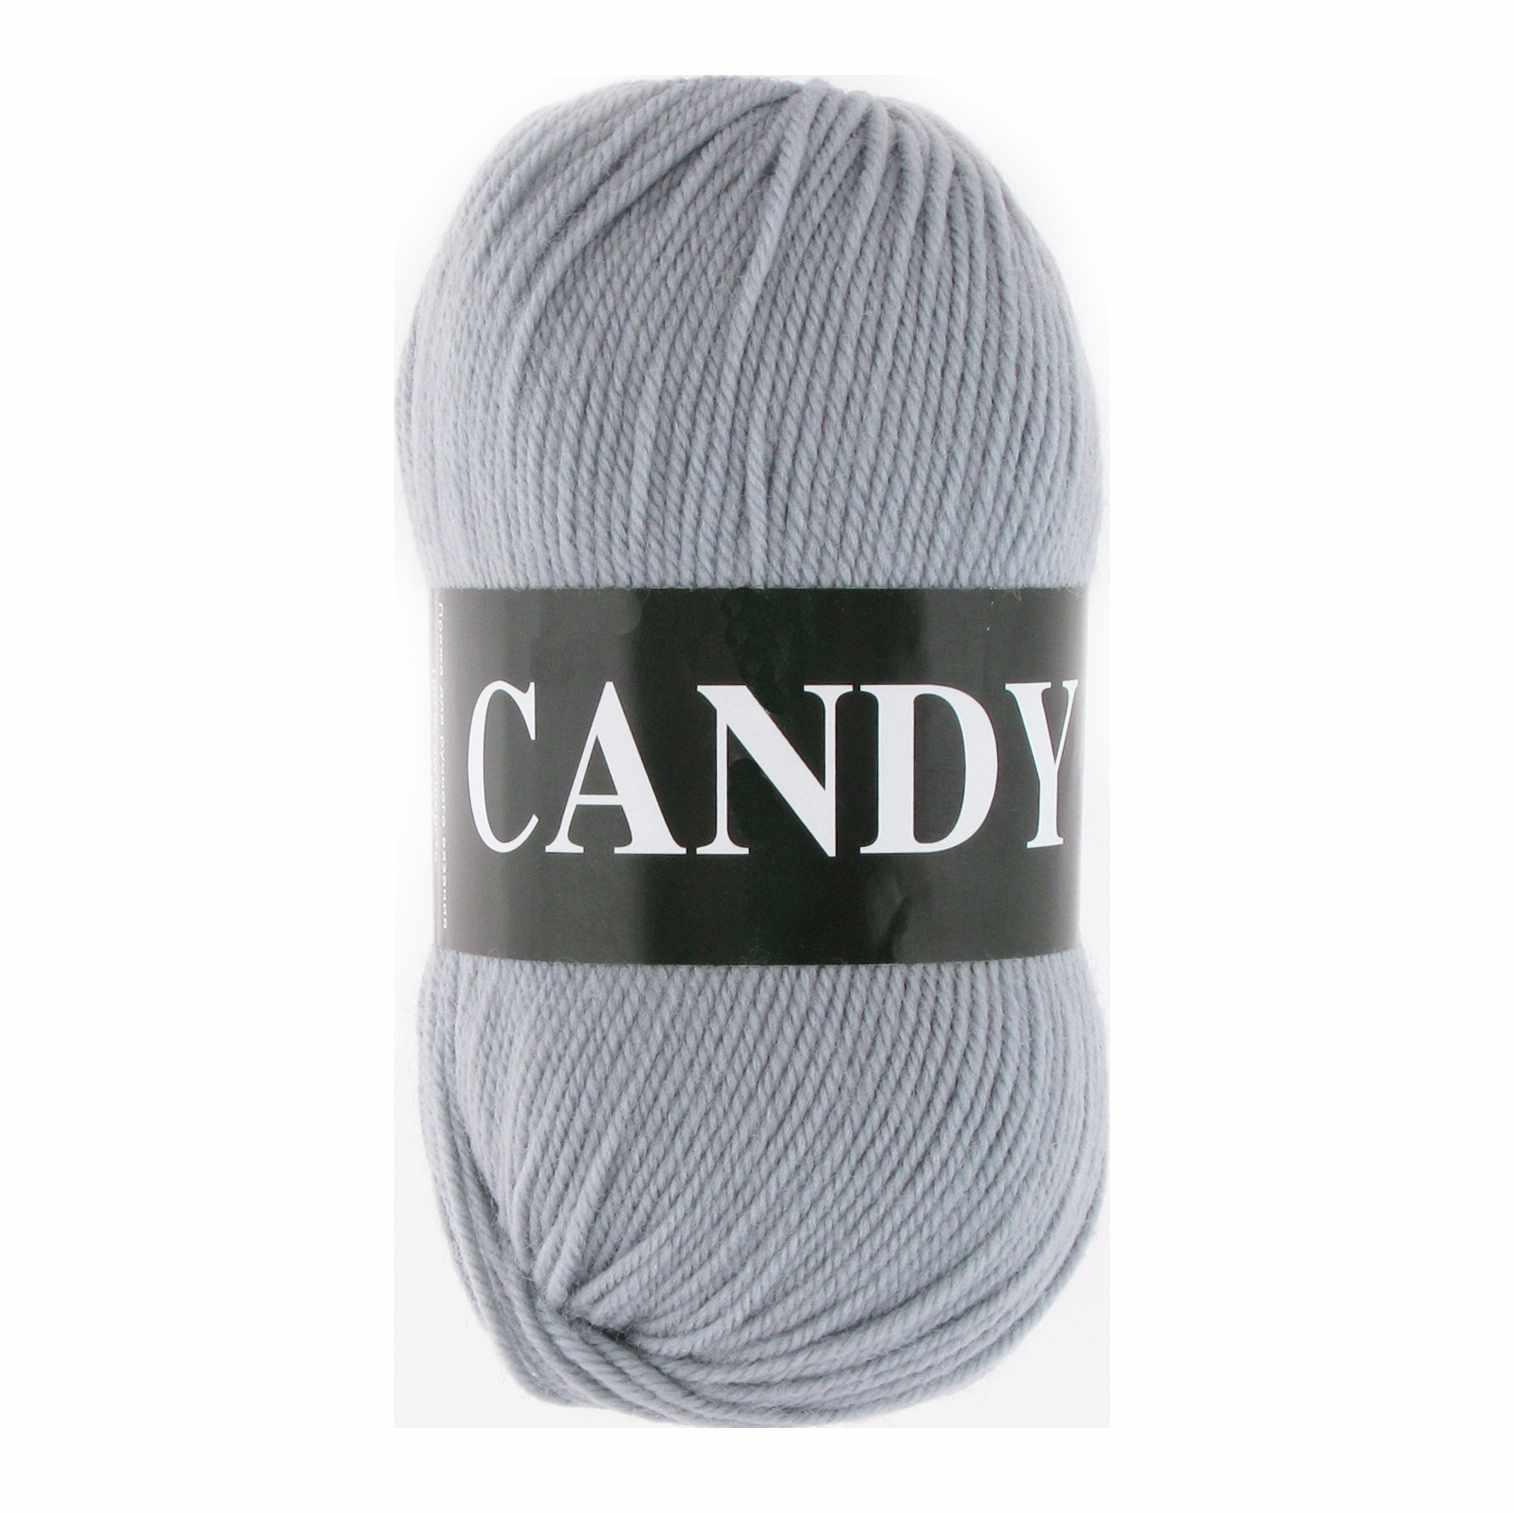 Пряжа VITA Candy Цвет.2531 Серебро